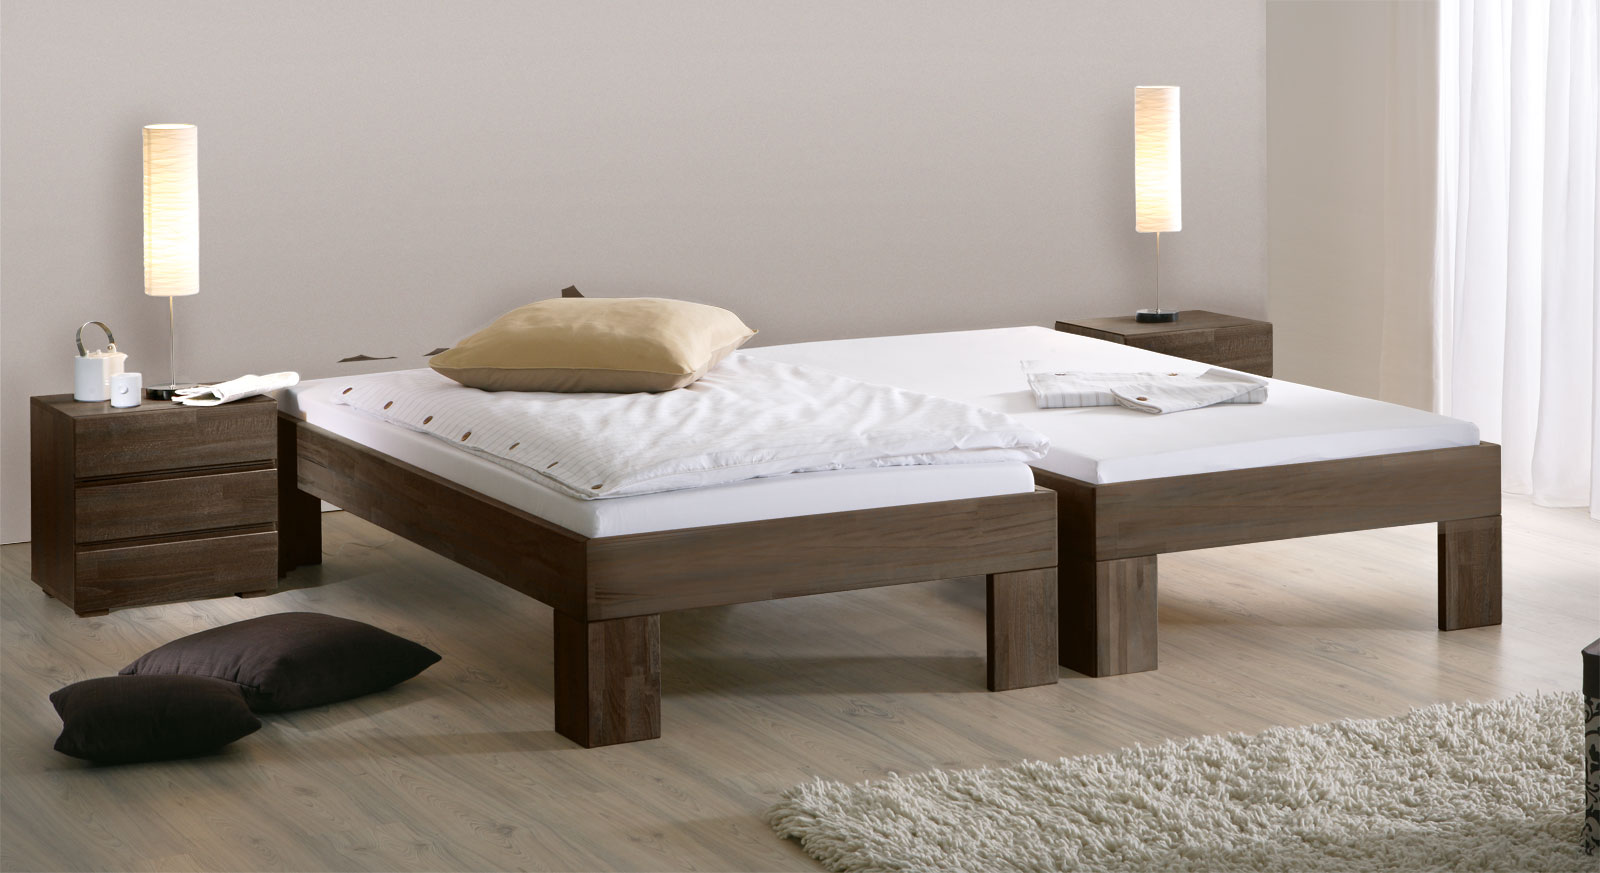 Liege Lucca Komfort in wengefarben mit stabiler Holzkonstruktion